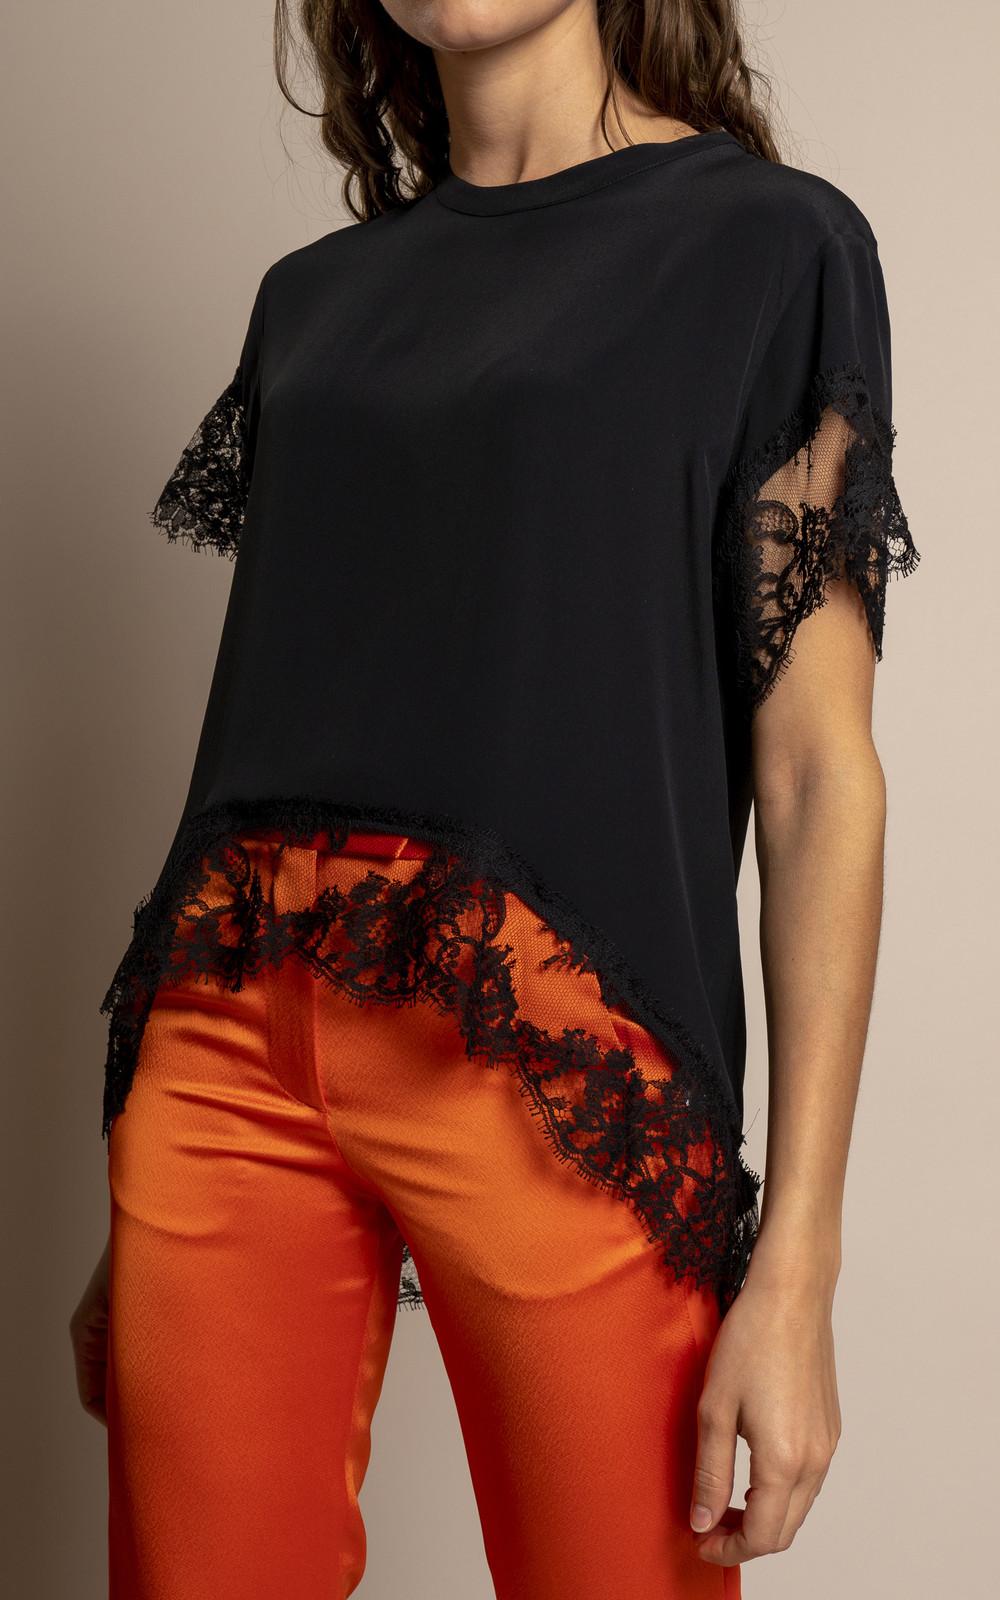 MSGM SS19 Blouse black lace